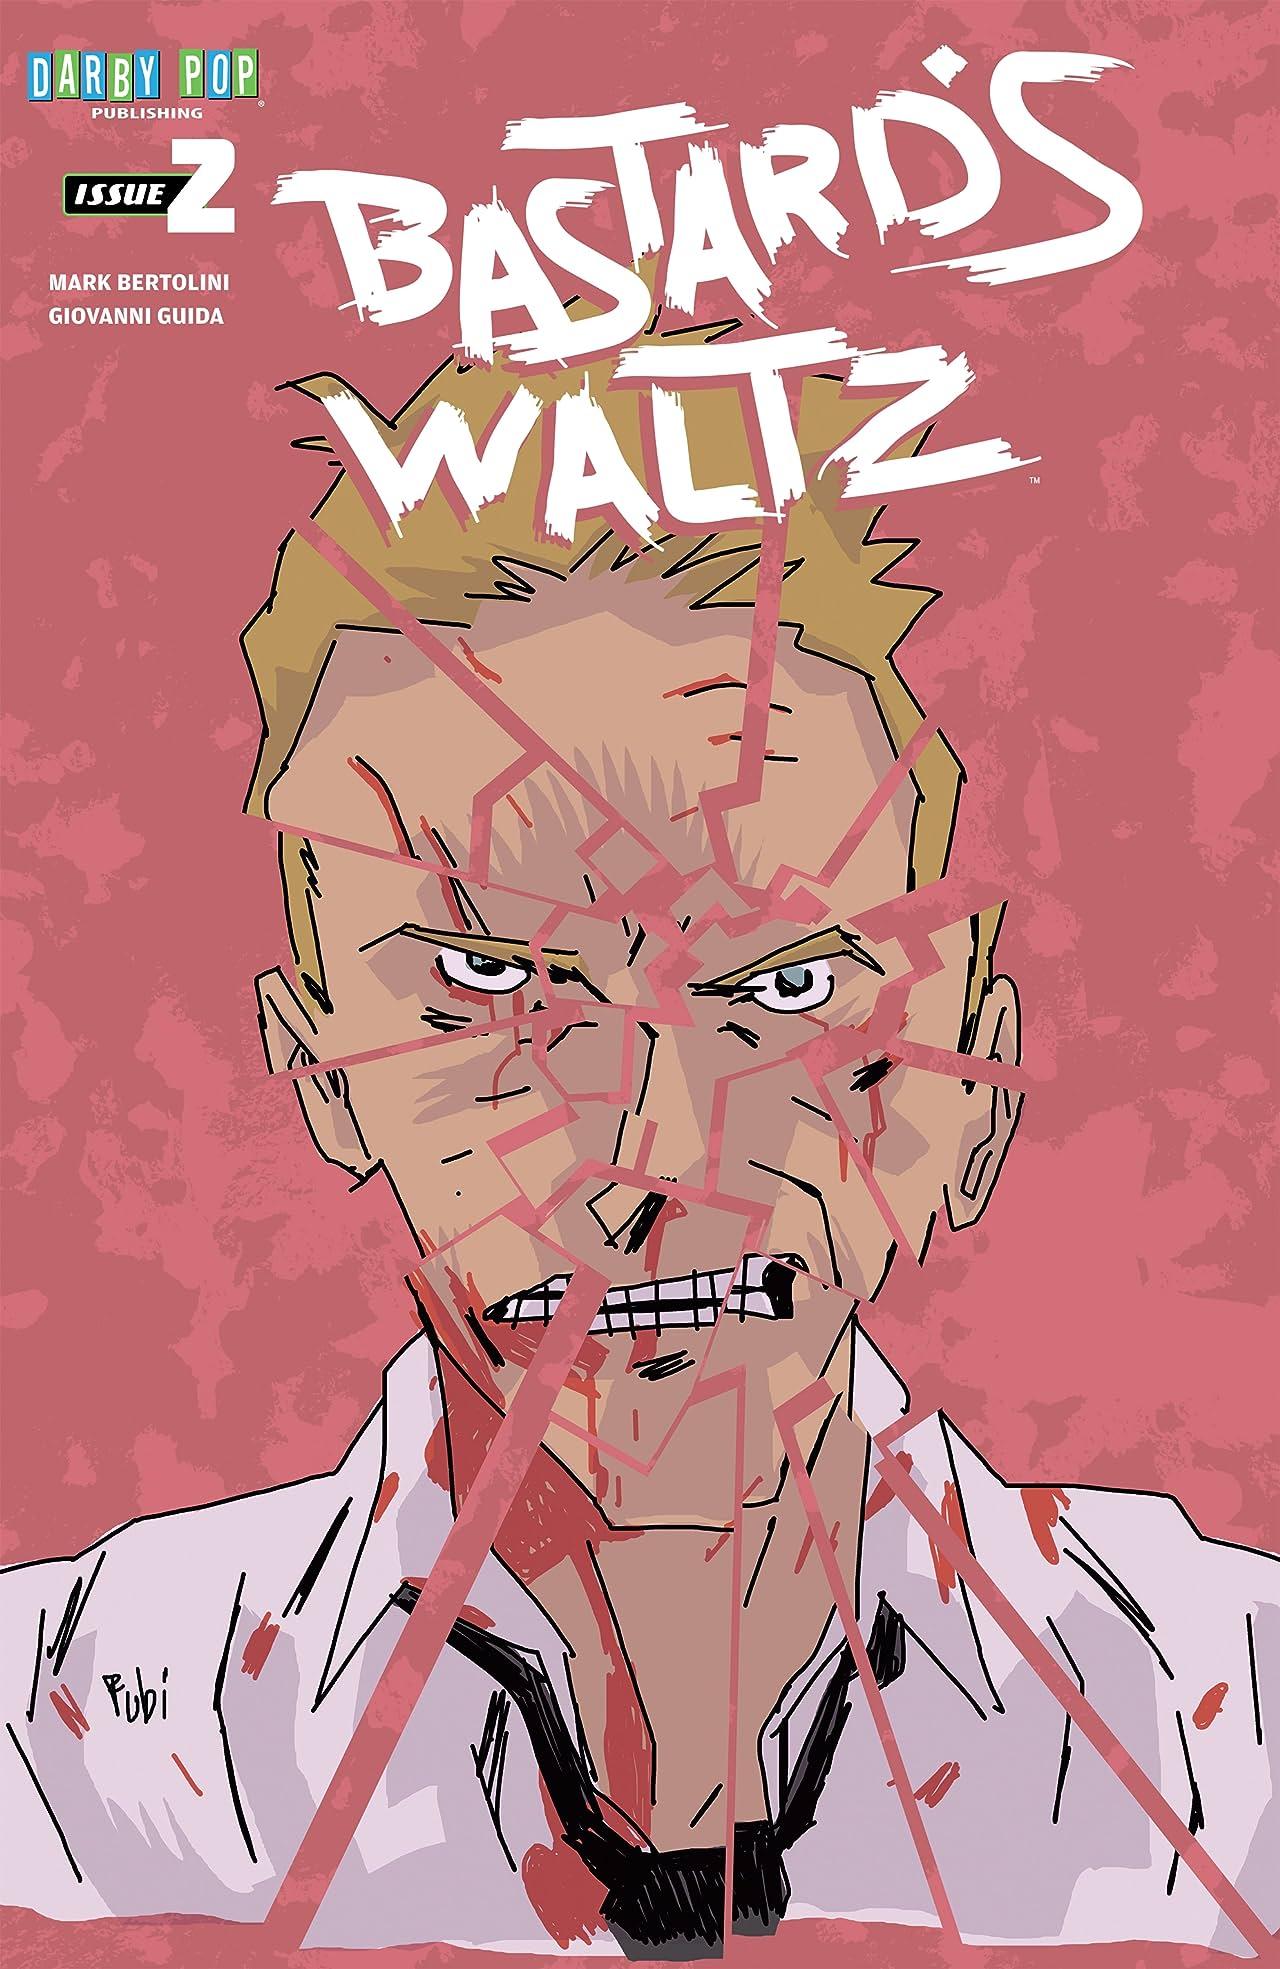 Bastard's Waltz #2: Two Snakes